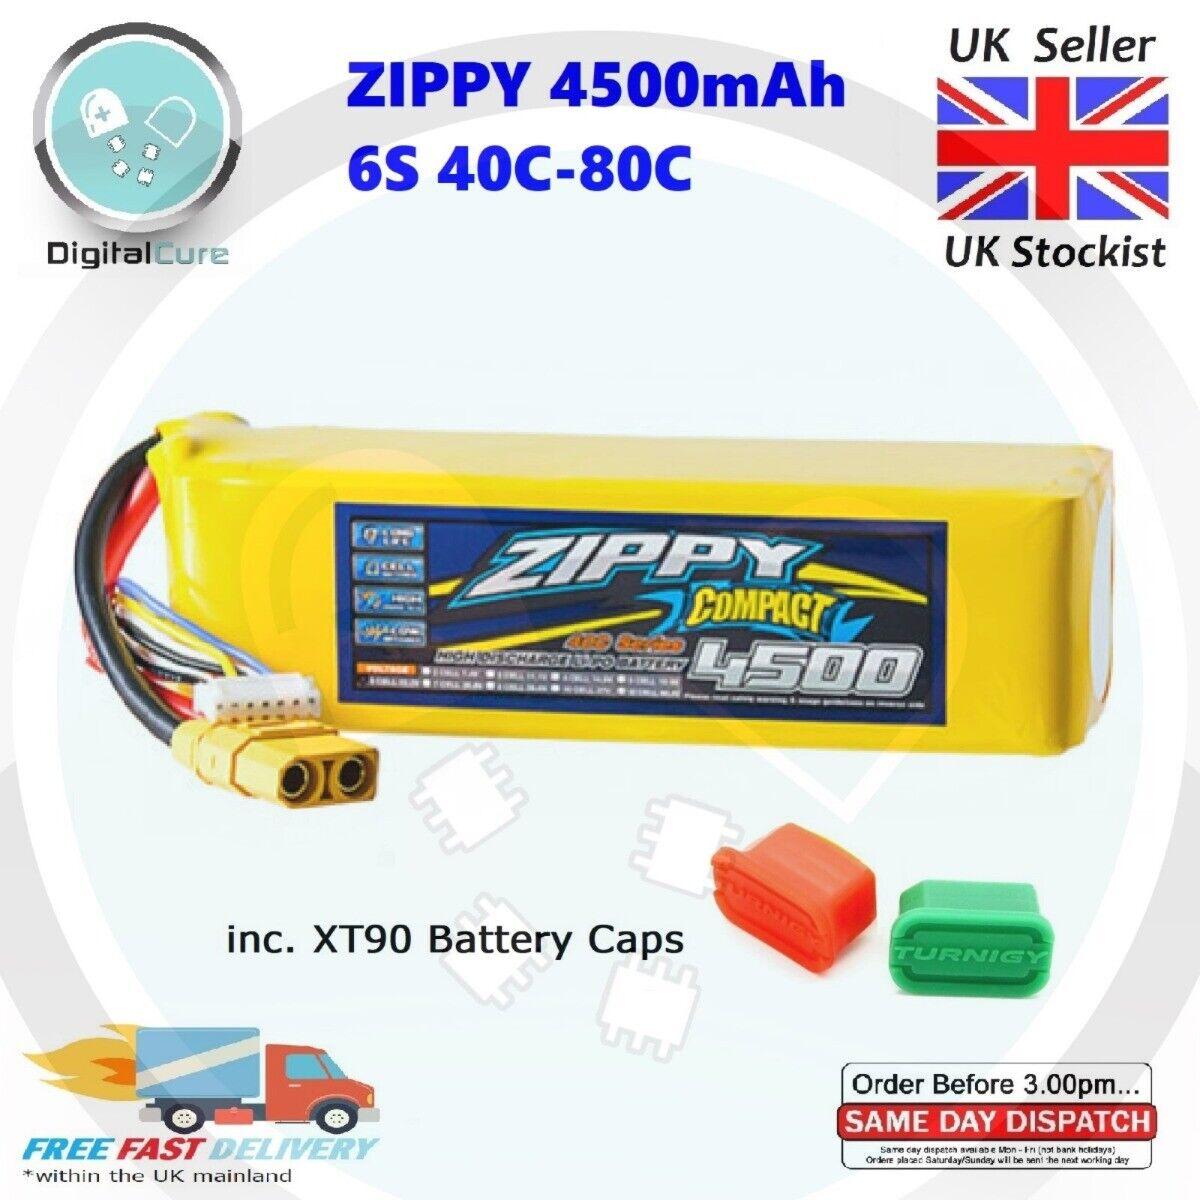 Zippy 4500mAh 6S 22.2V 40C-80C XT90 Lipo Battery + Caps - 5000 3000 4000